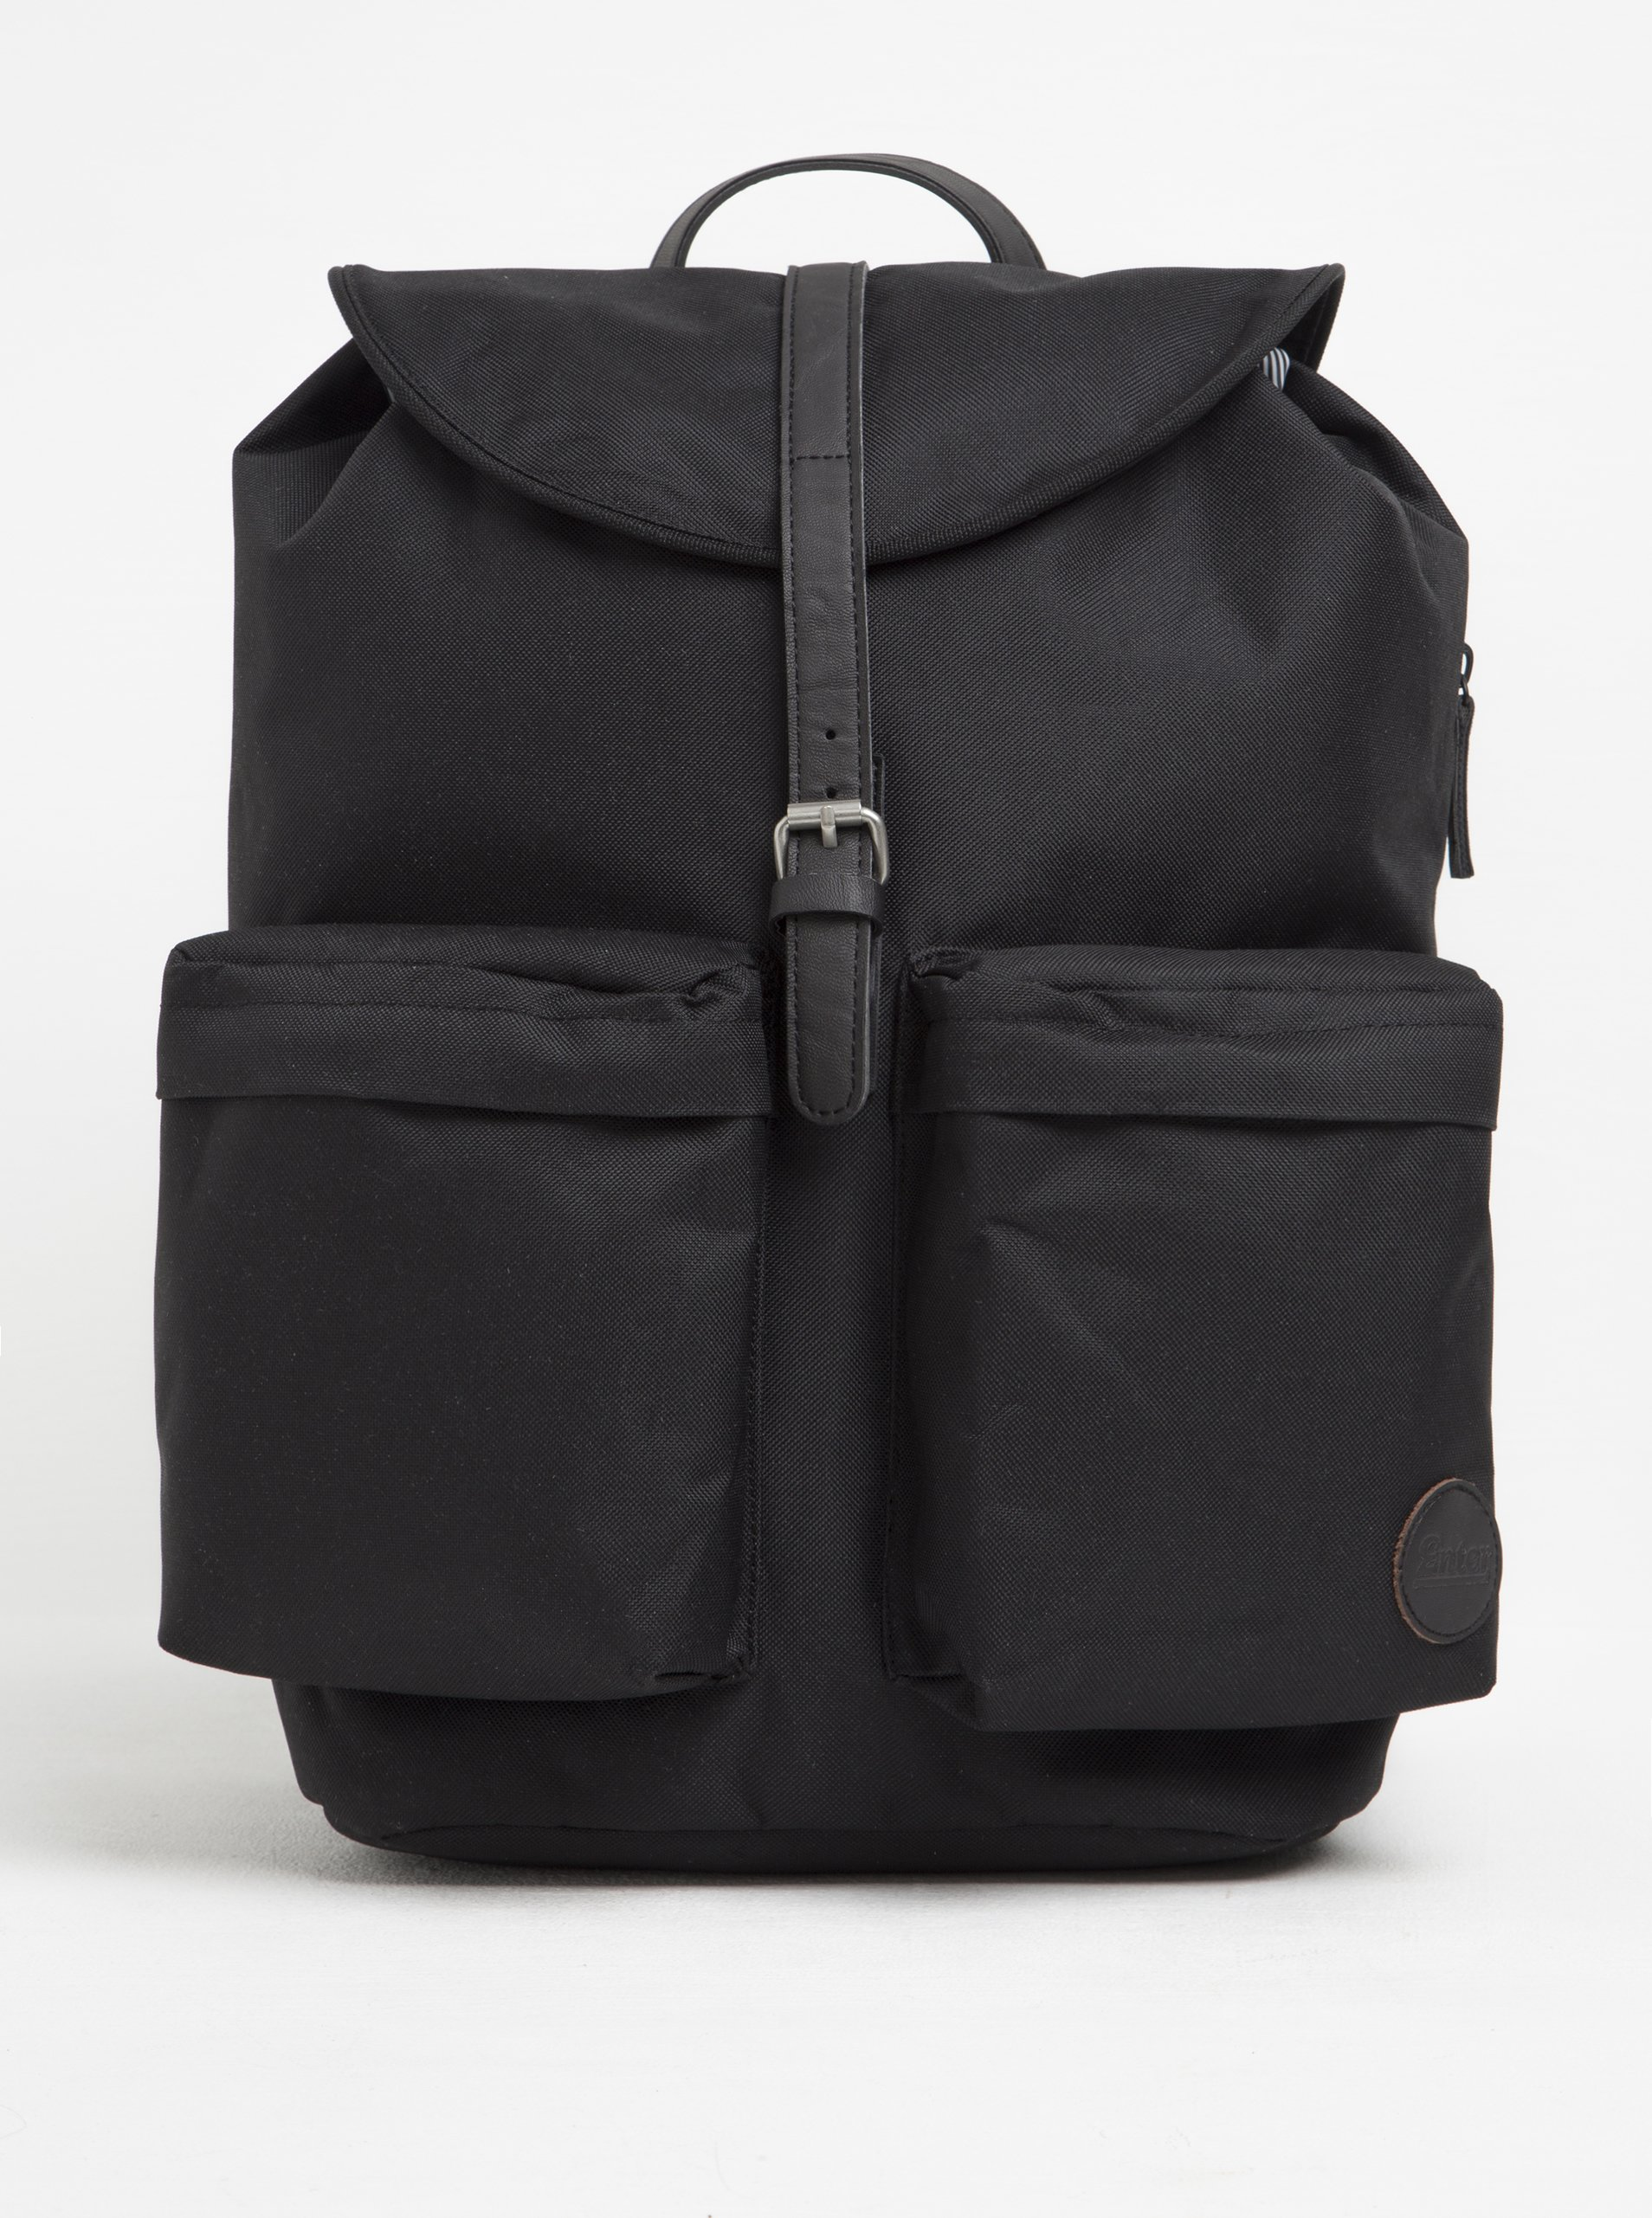 Černý batoh s kapsami Enter Hiker 15 l